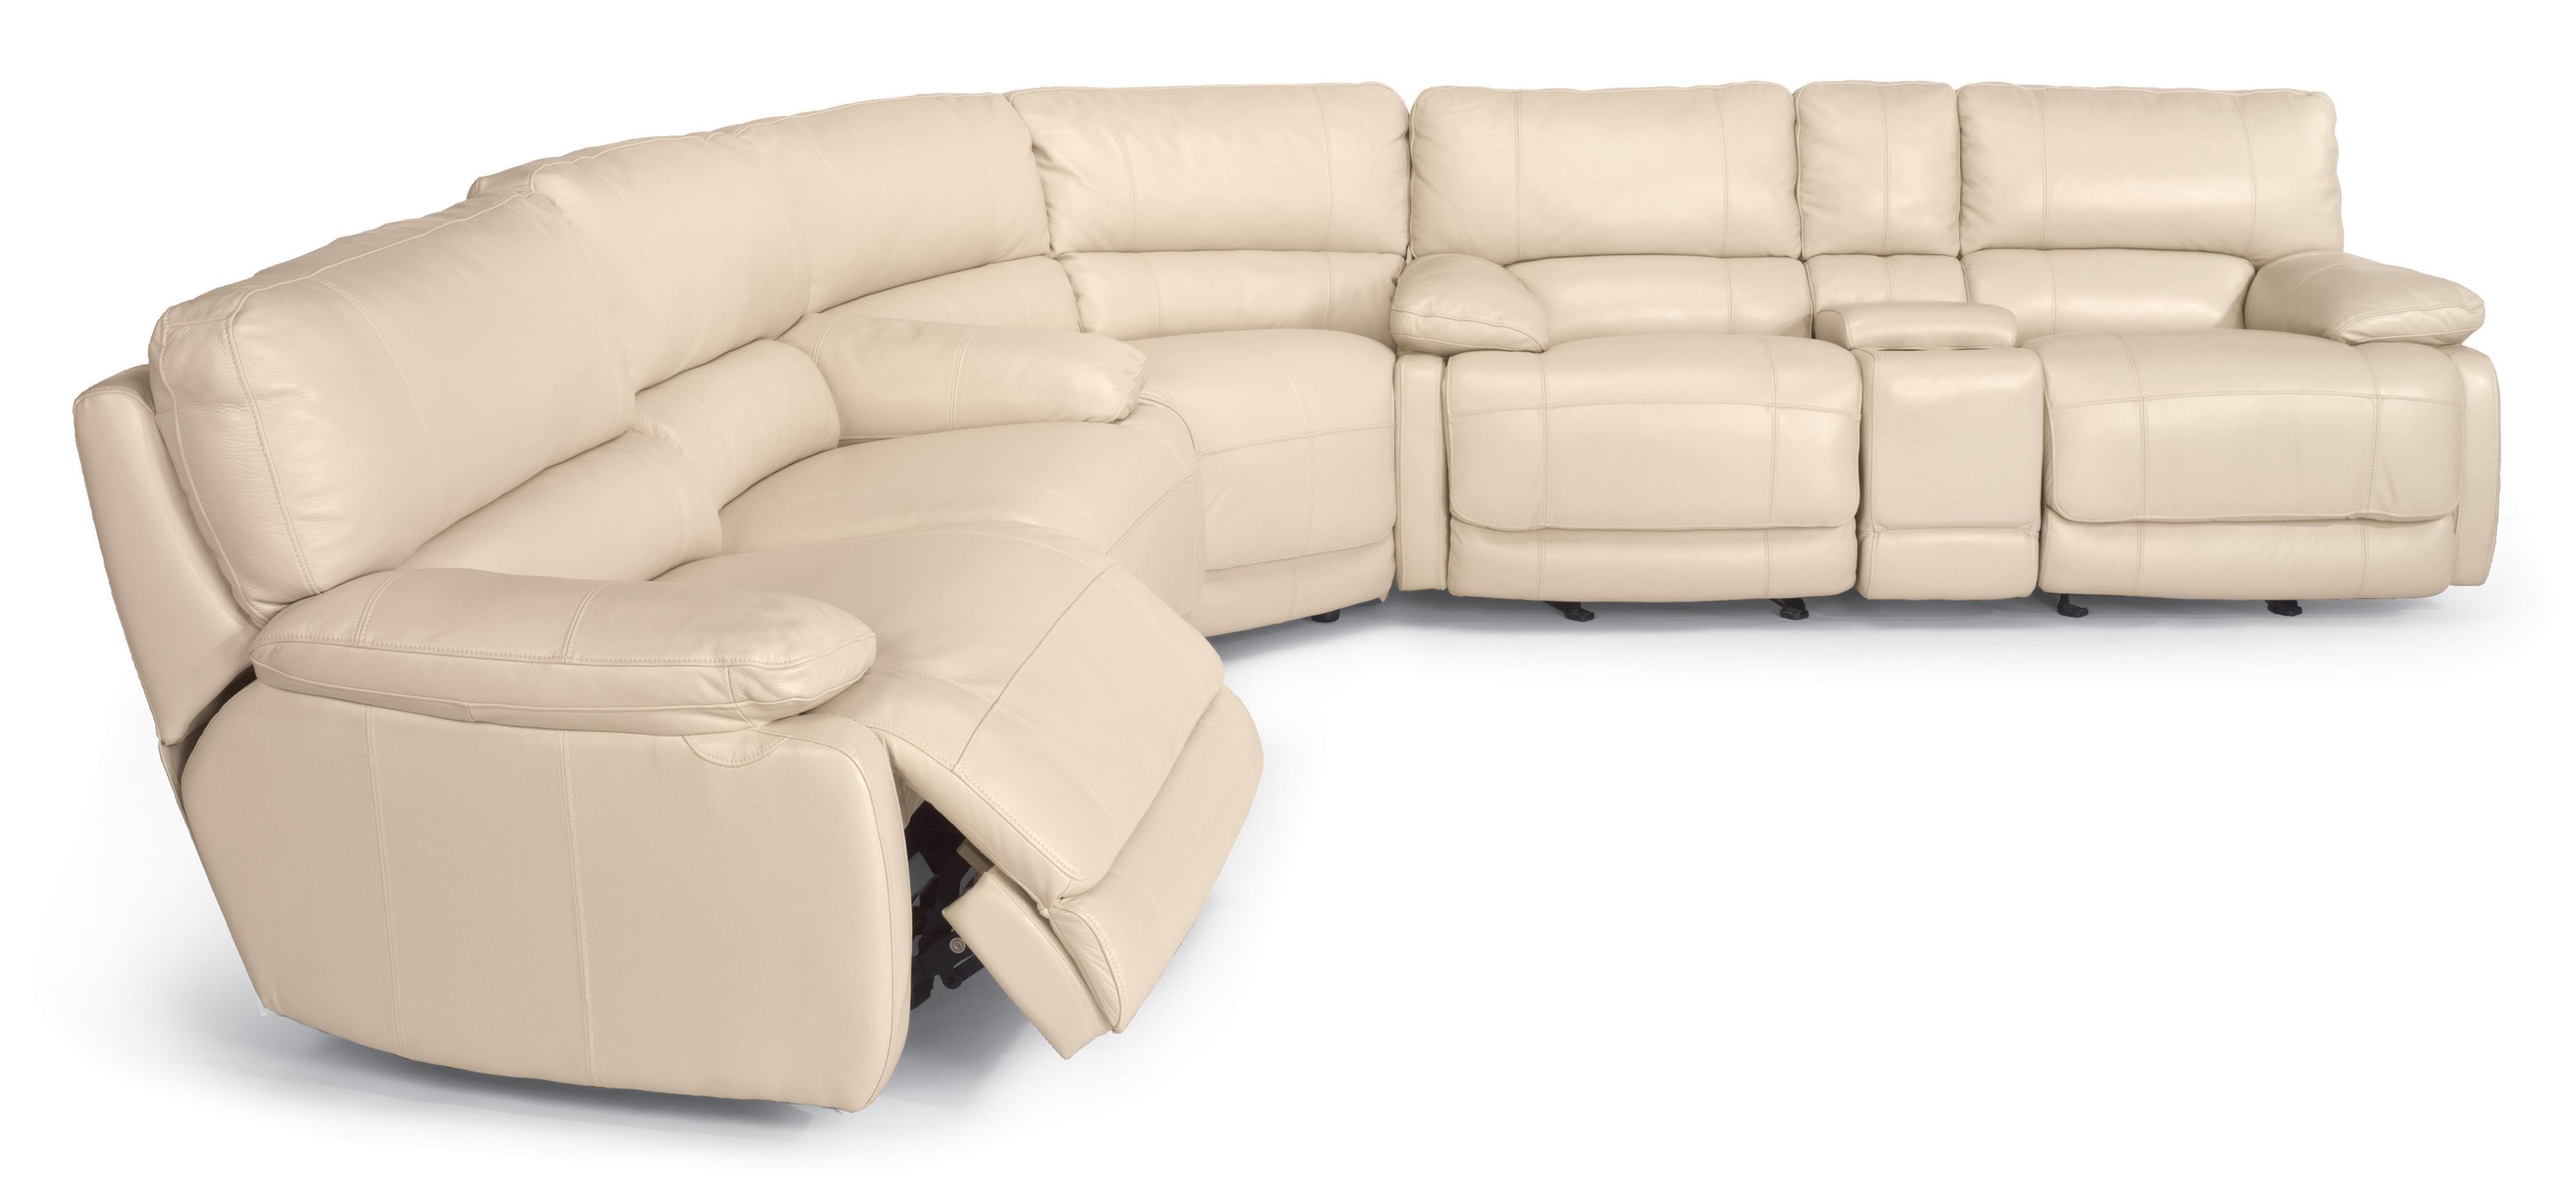 Flexsteel Latitudes – Hermosa Reclining Sectional Sofa – Ahfa In Kansas City Mo Sectional Sofas (View 7 of 10)